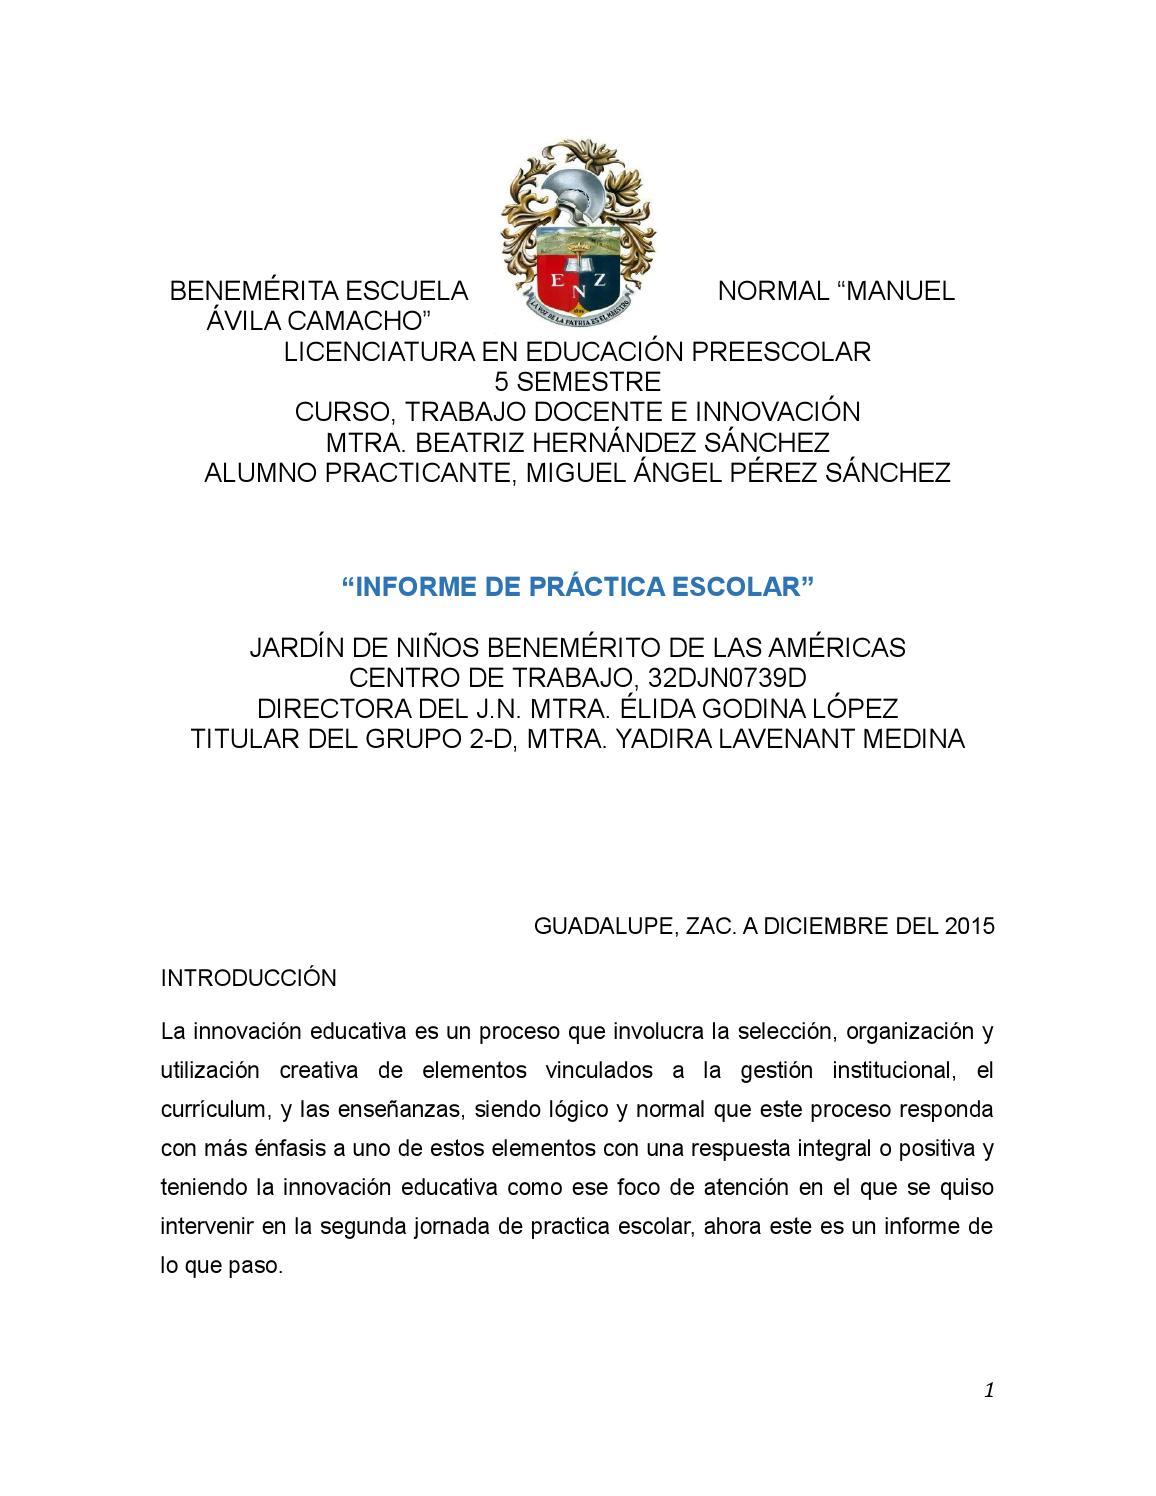 Informe de práctica docente by Ángel Pérez - issuu